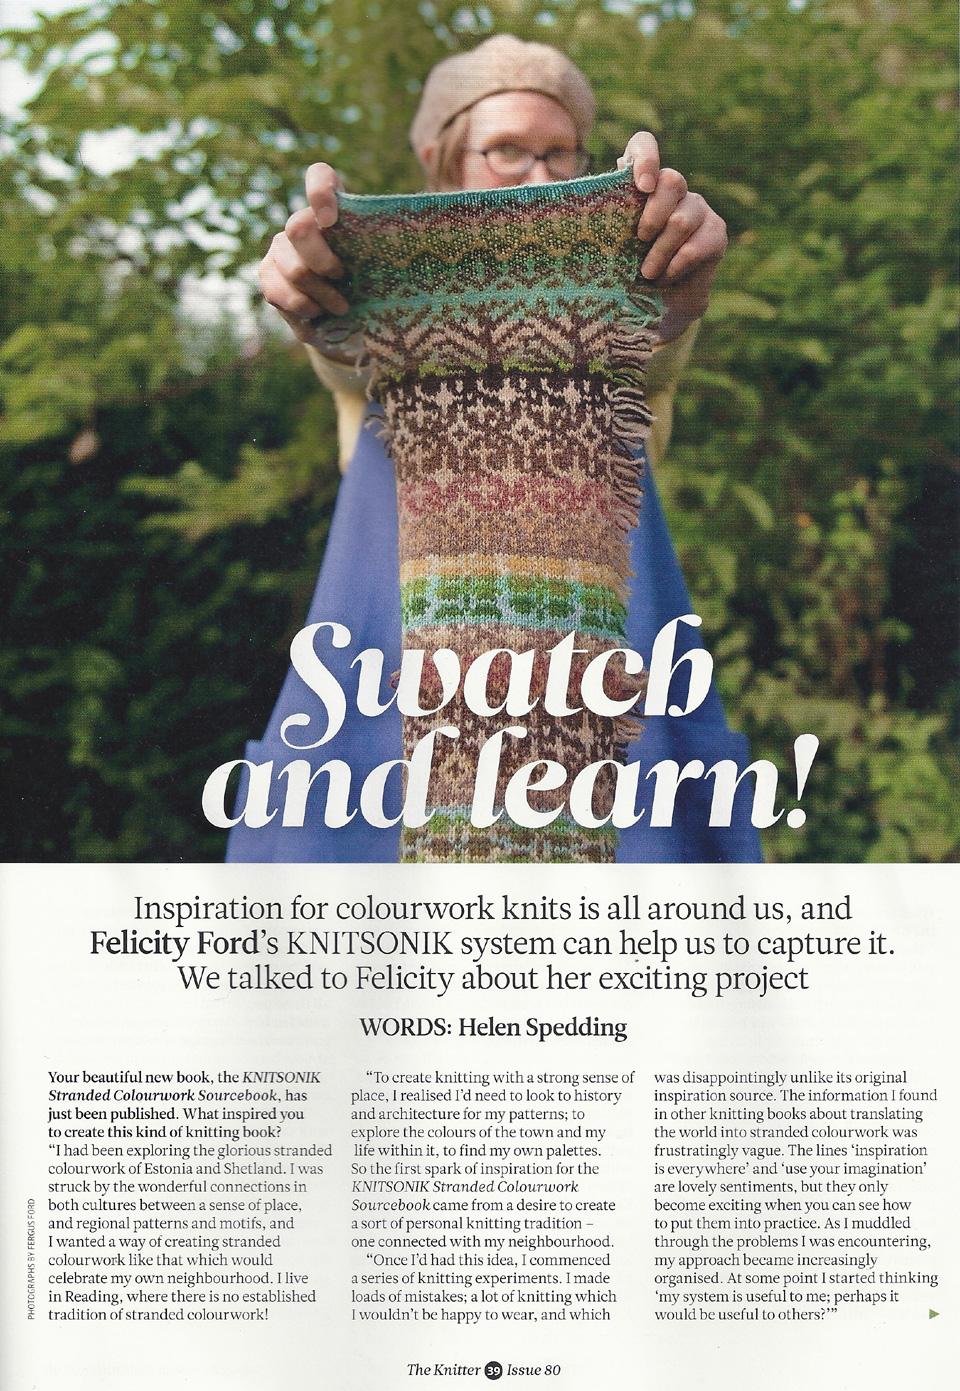 The Knitter magazine, January 2015